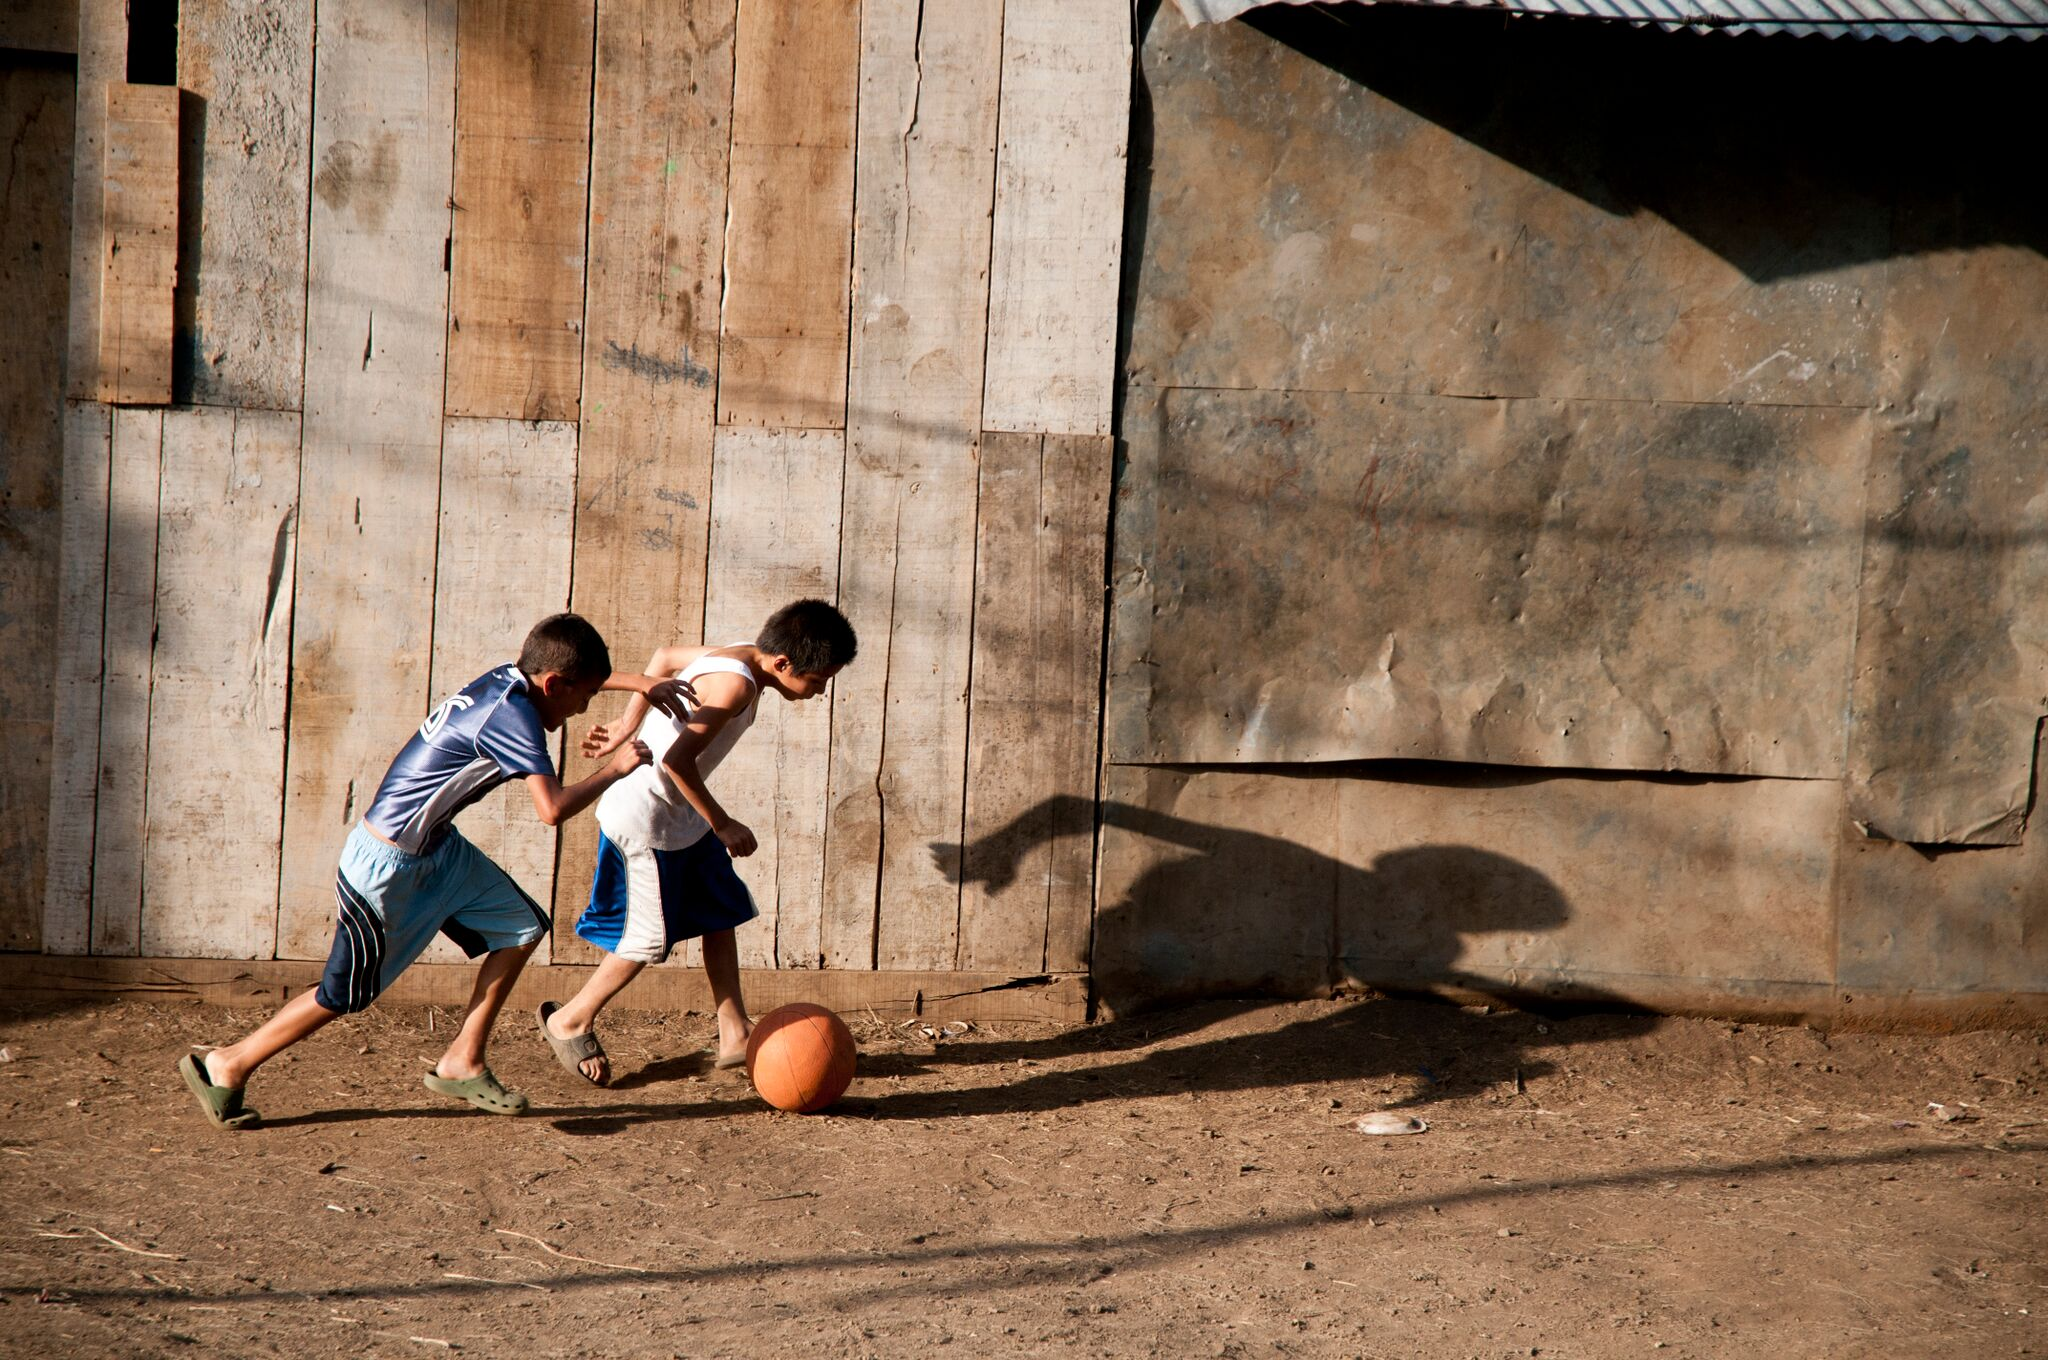 Children Score International